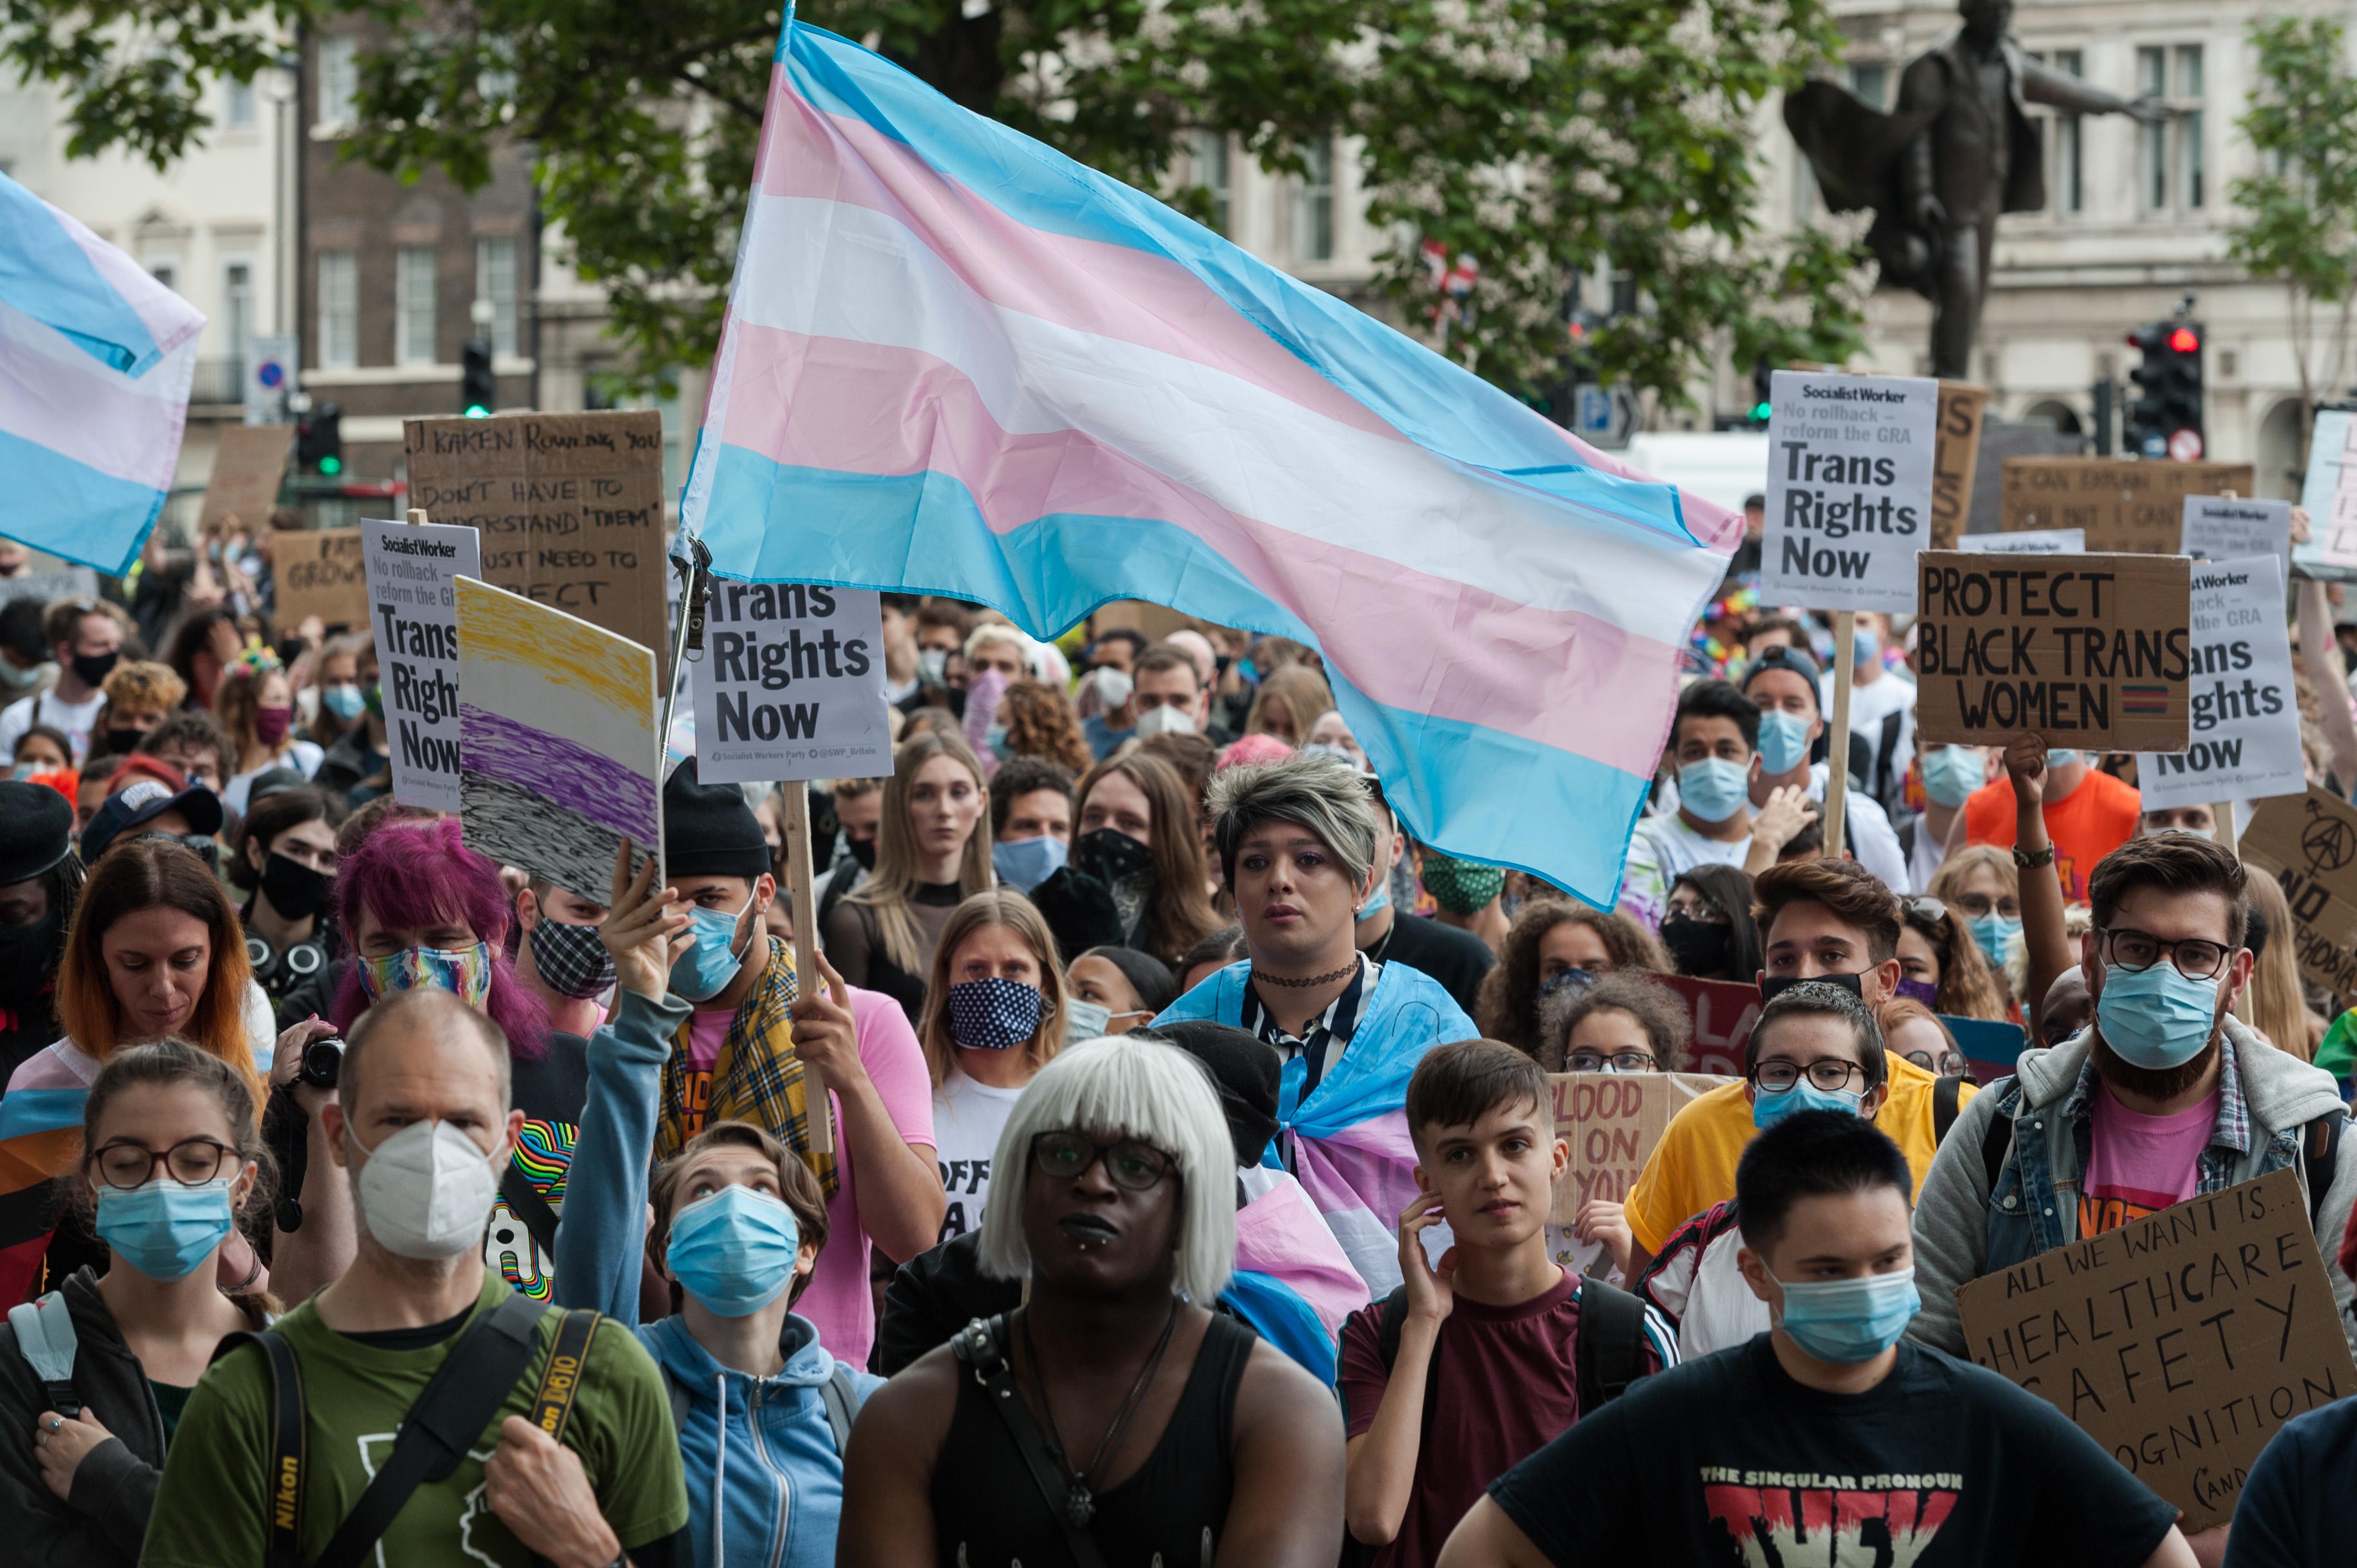 Transgender People Protest In London